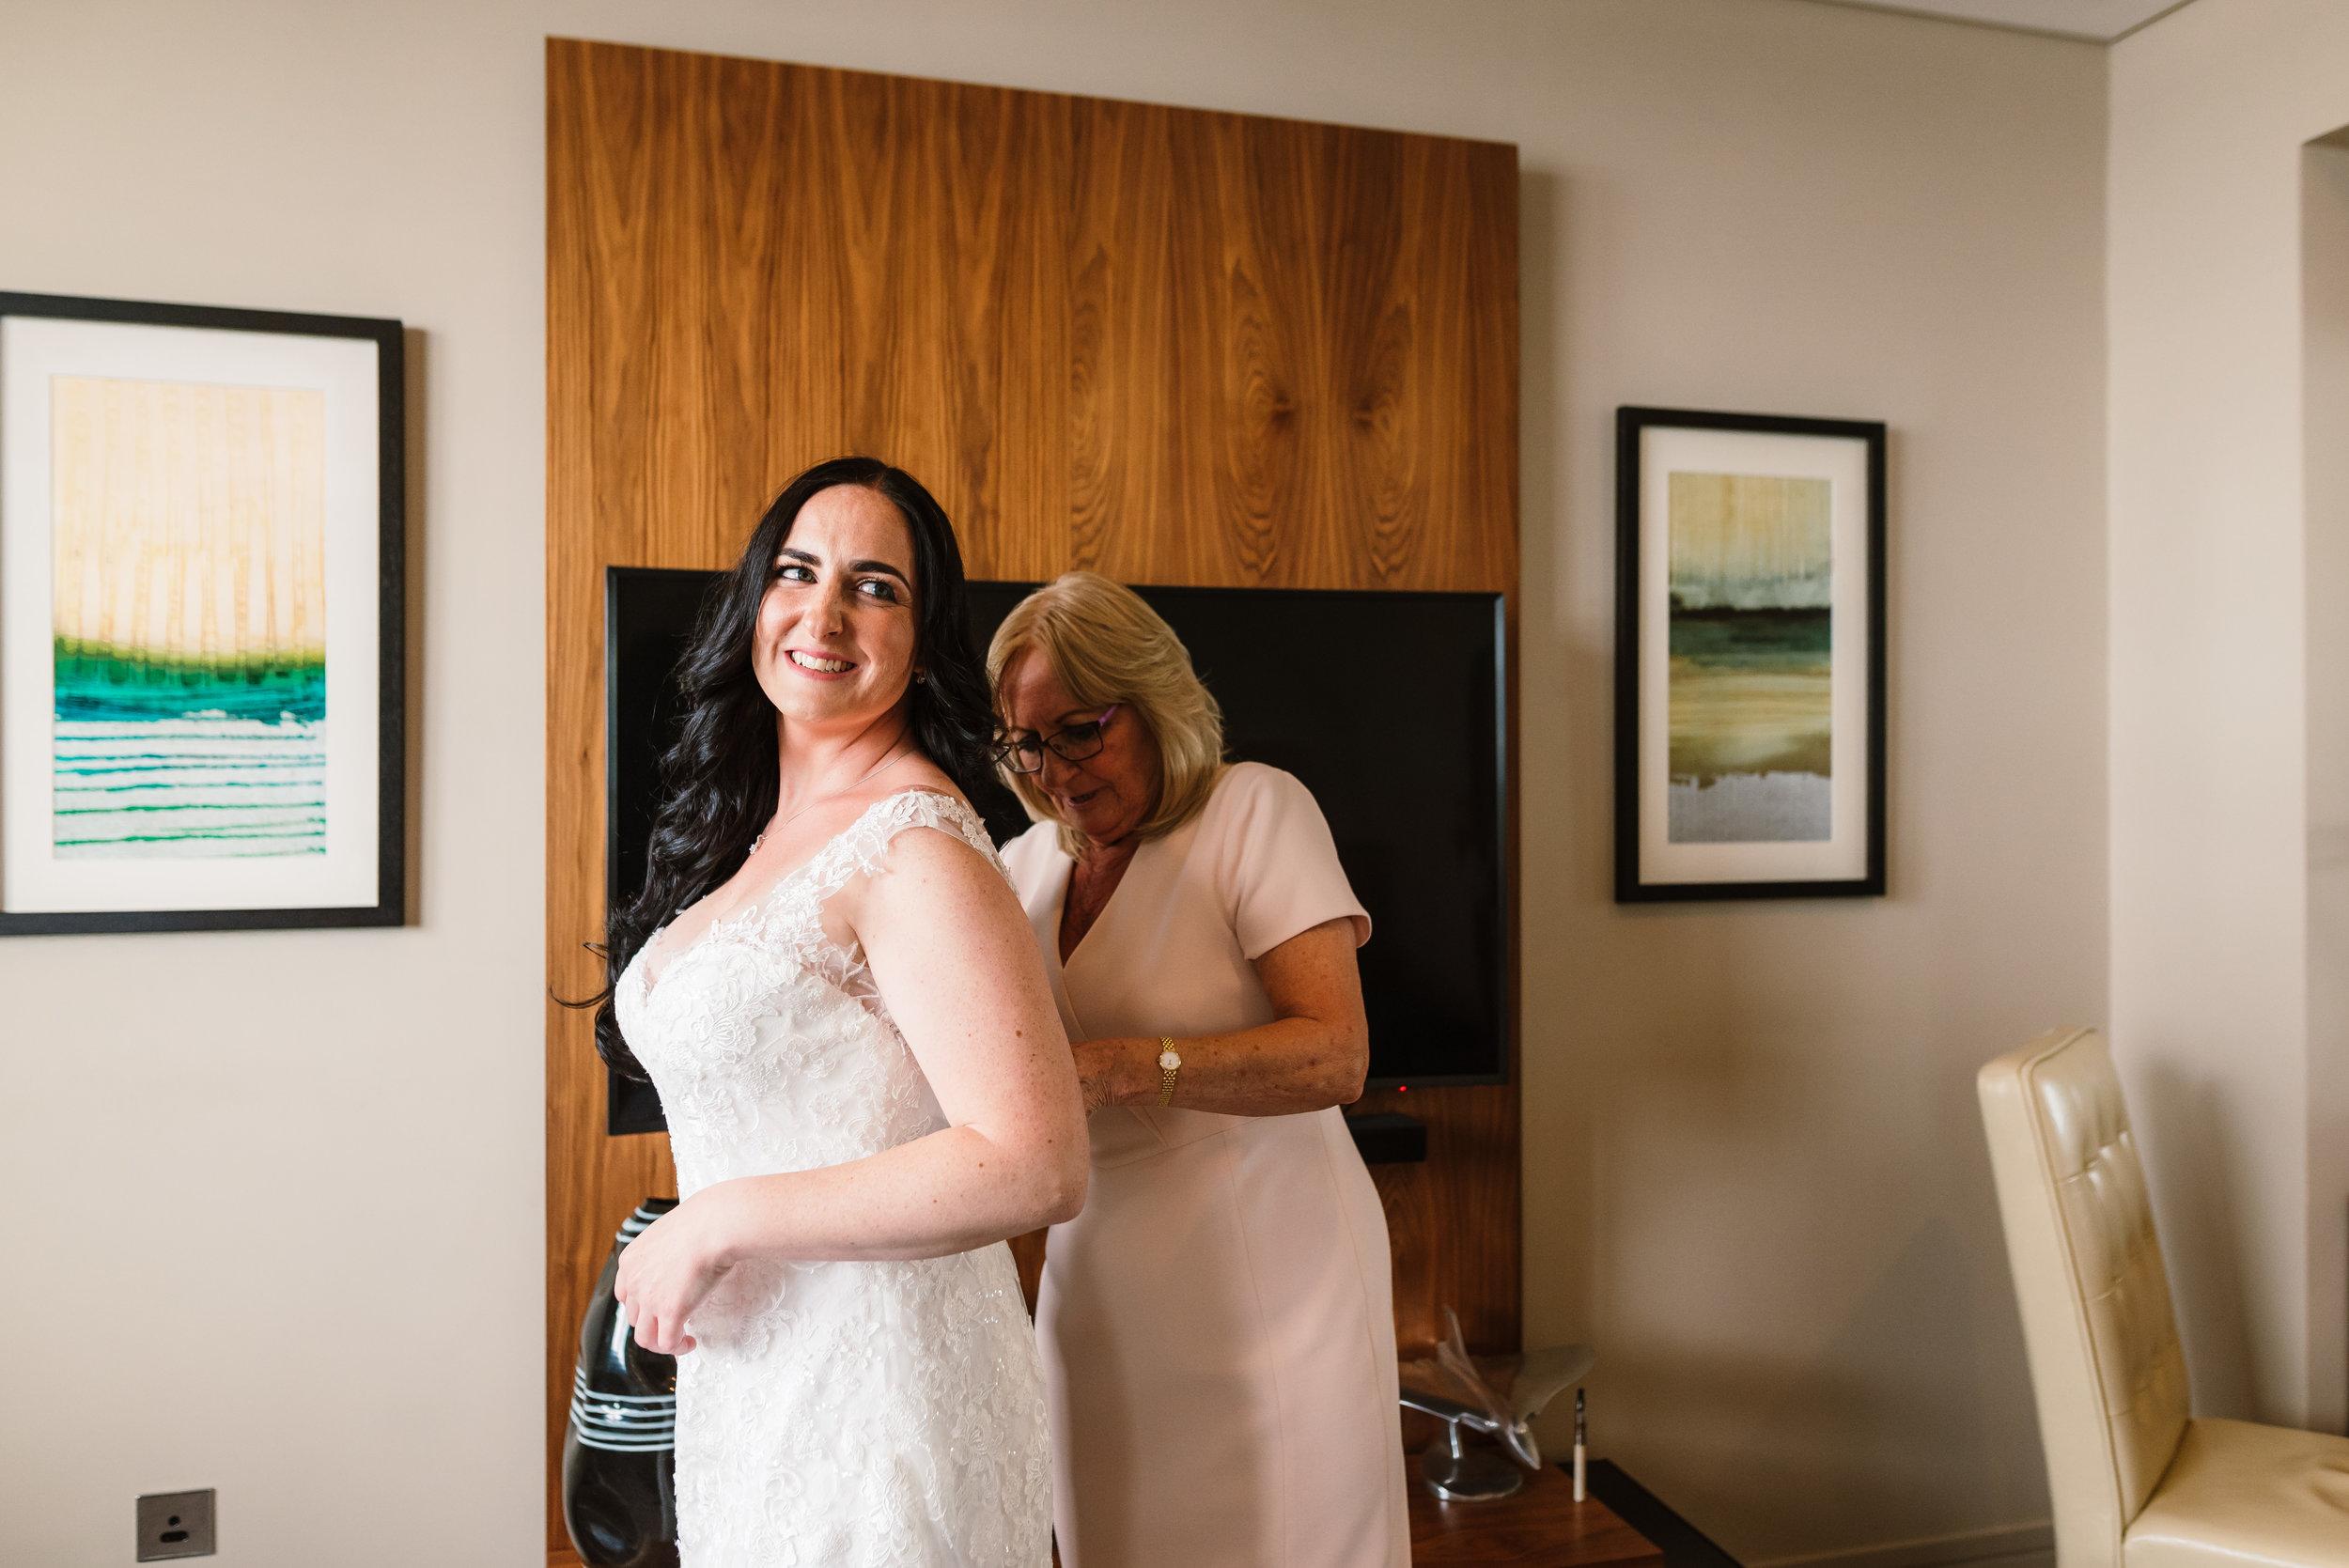 Sarah-Fishlock-Photography / Hampshire-wedding-photographer-Hamphire / Fleet-wedding-photographer-Fleet / Meade-Hall-Wedding-Venue / Meade-Hall-Wedding